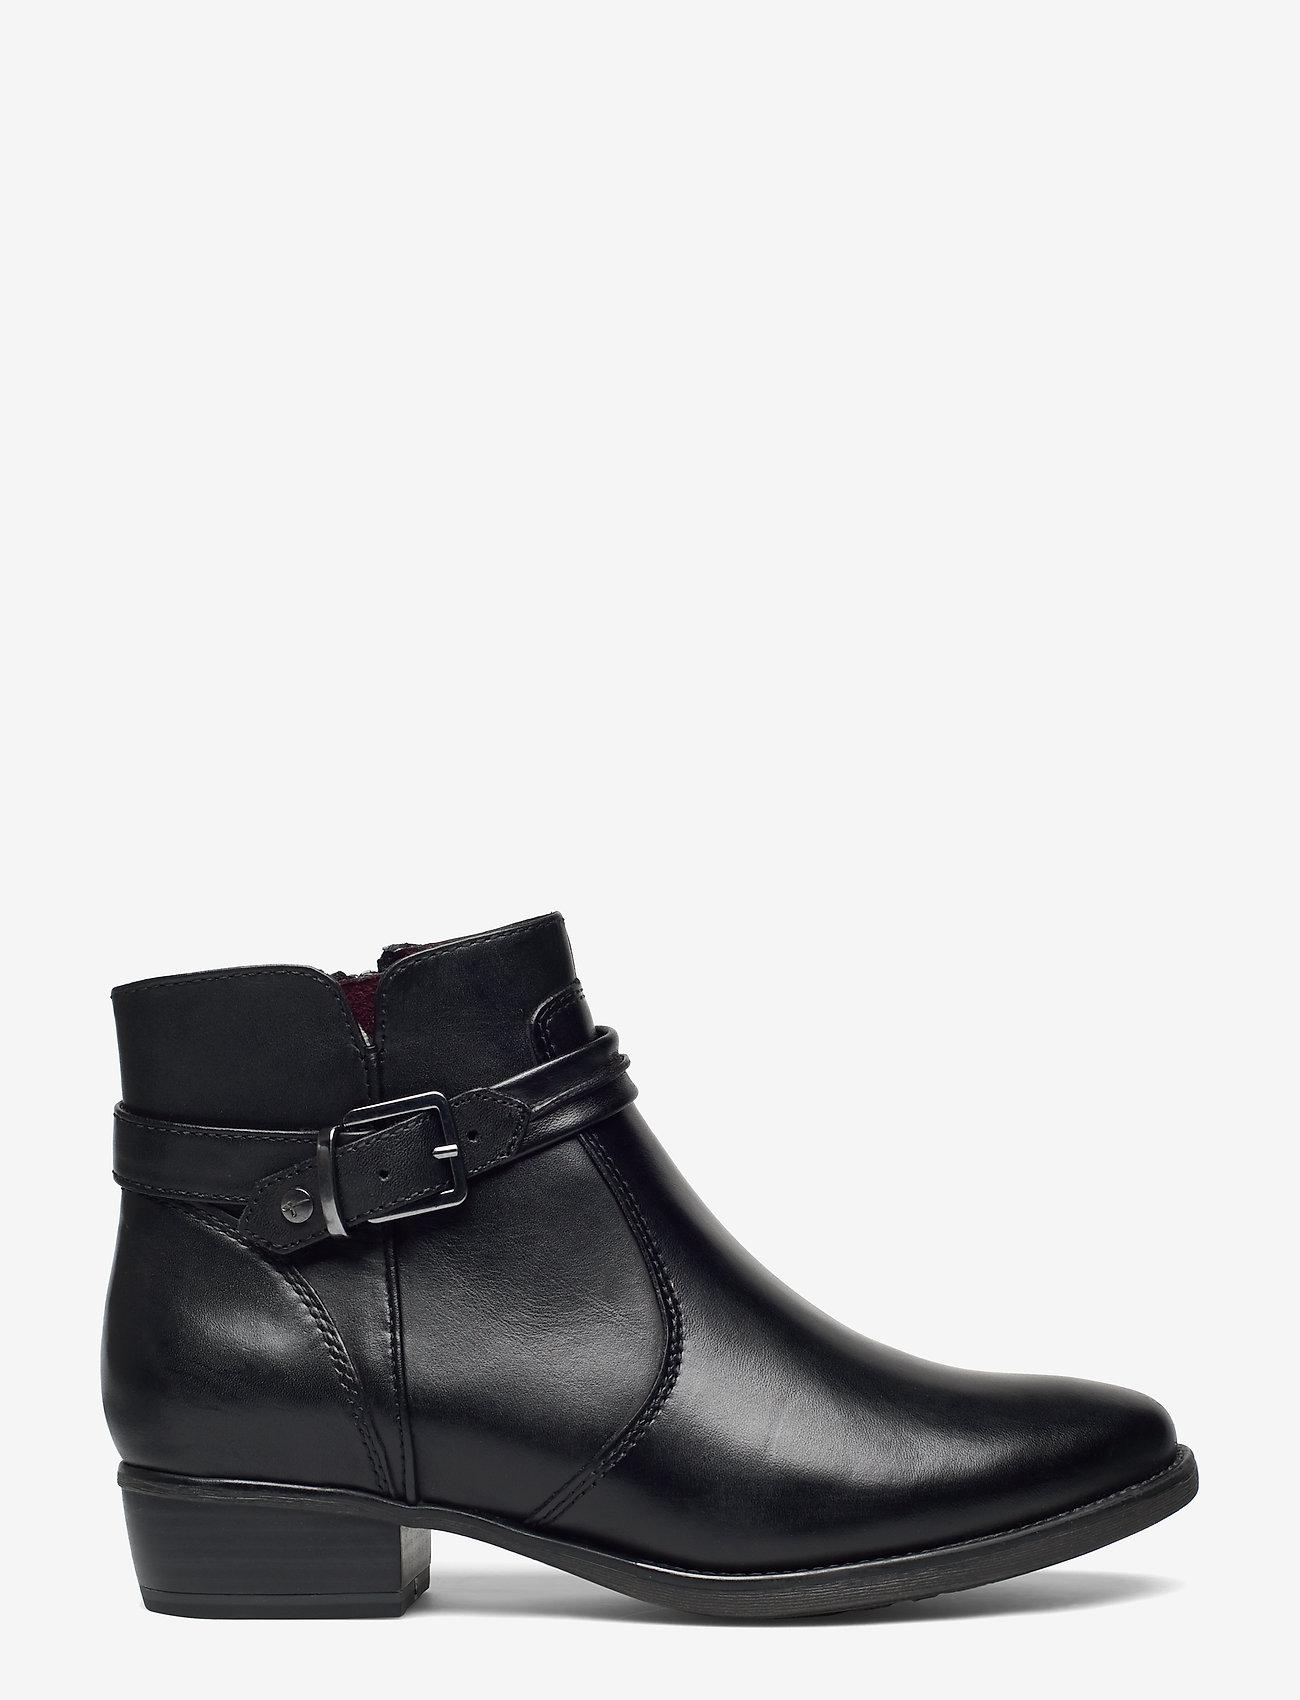 Tamaris - Boots - platta ankelboots - black - 1